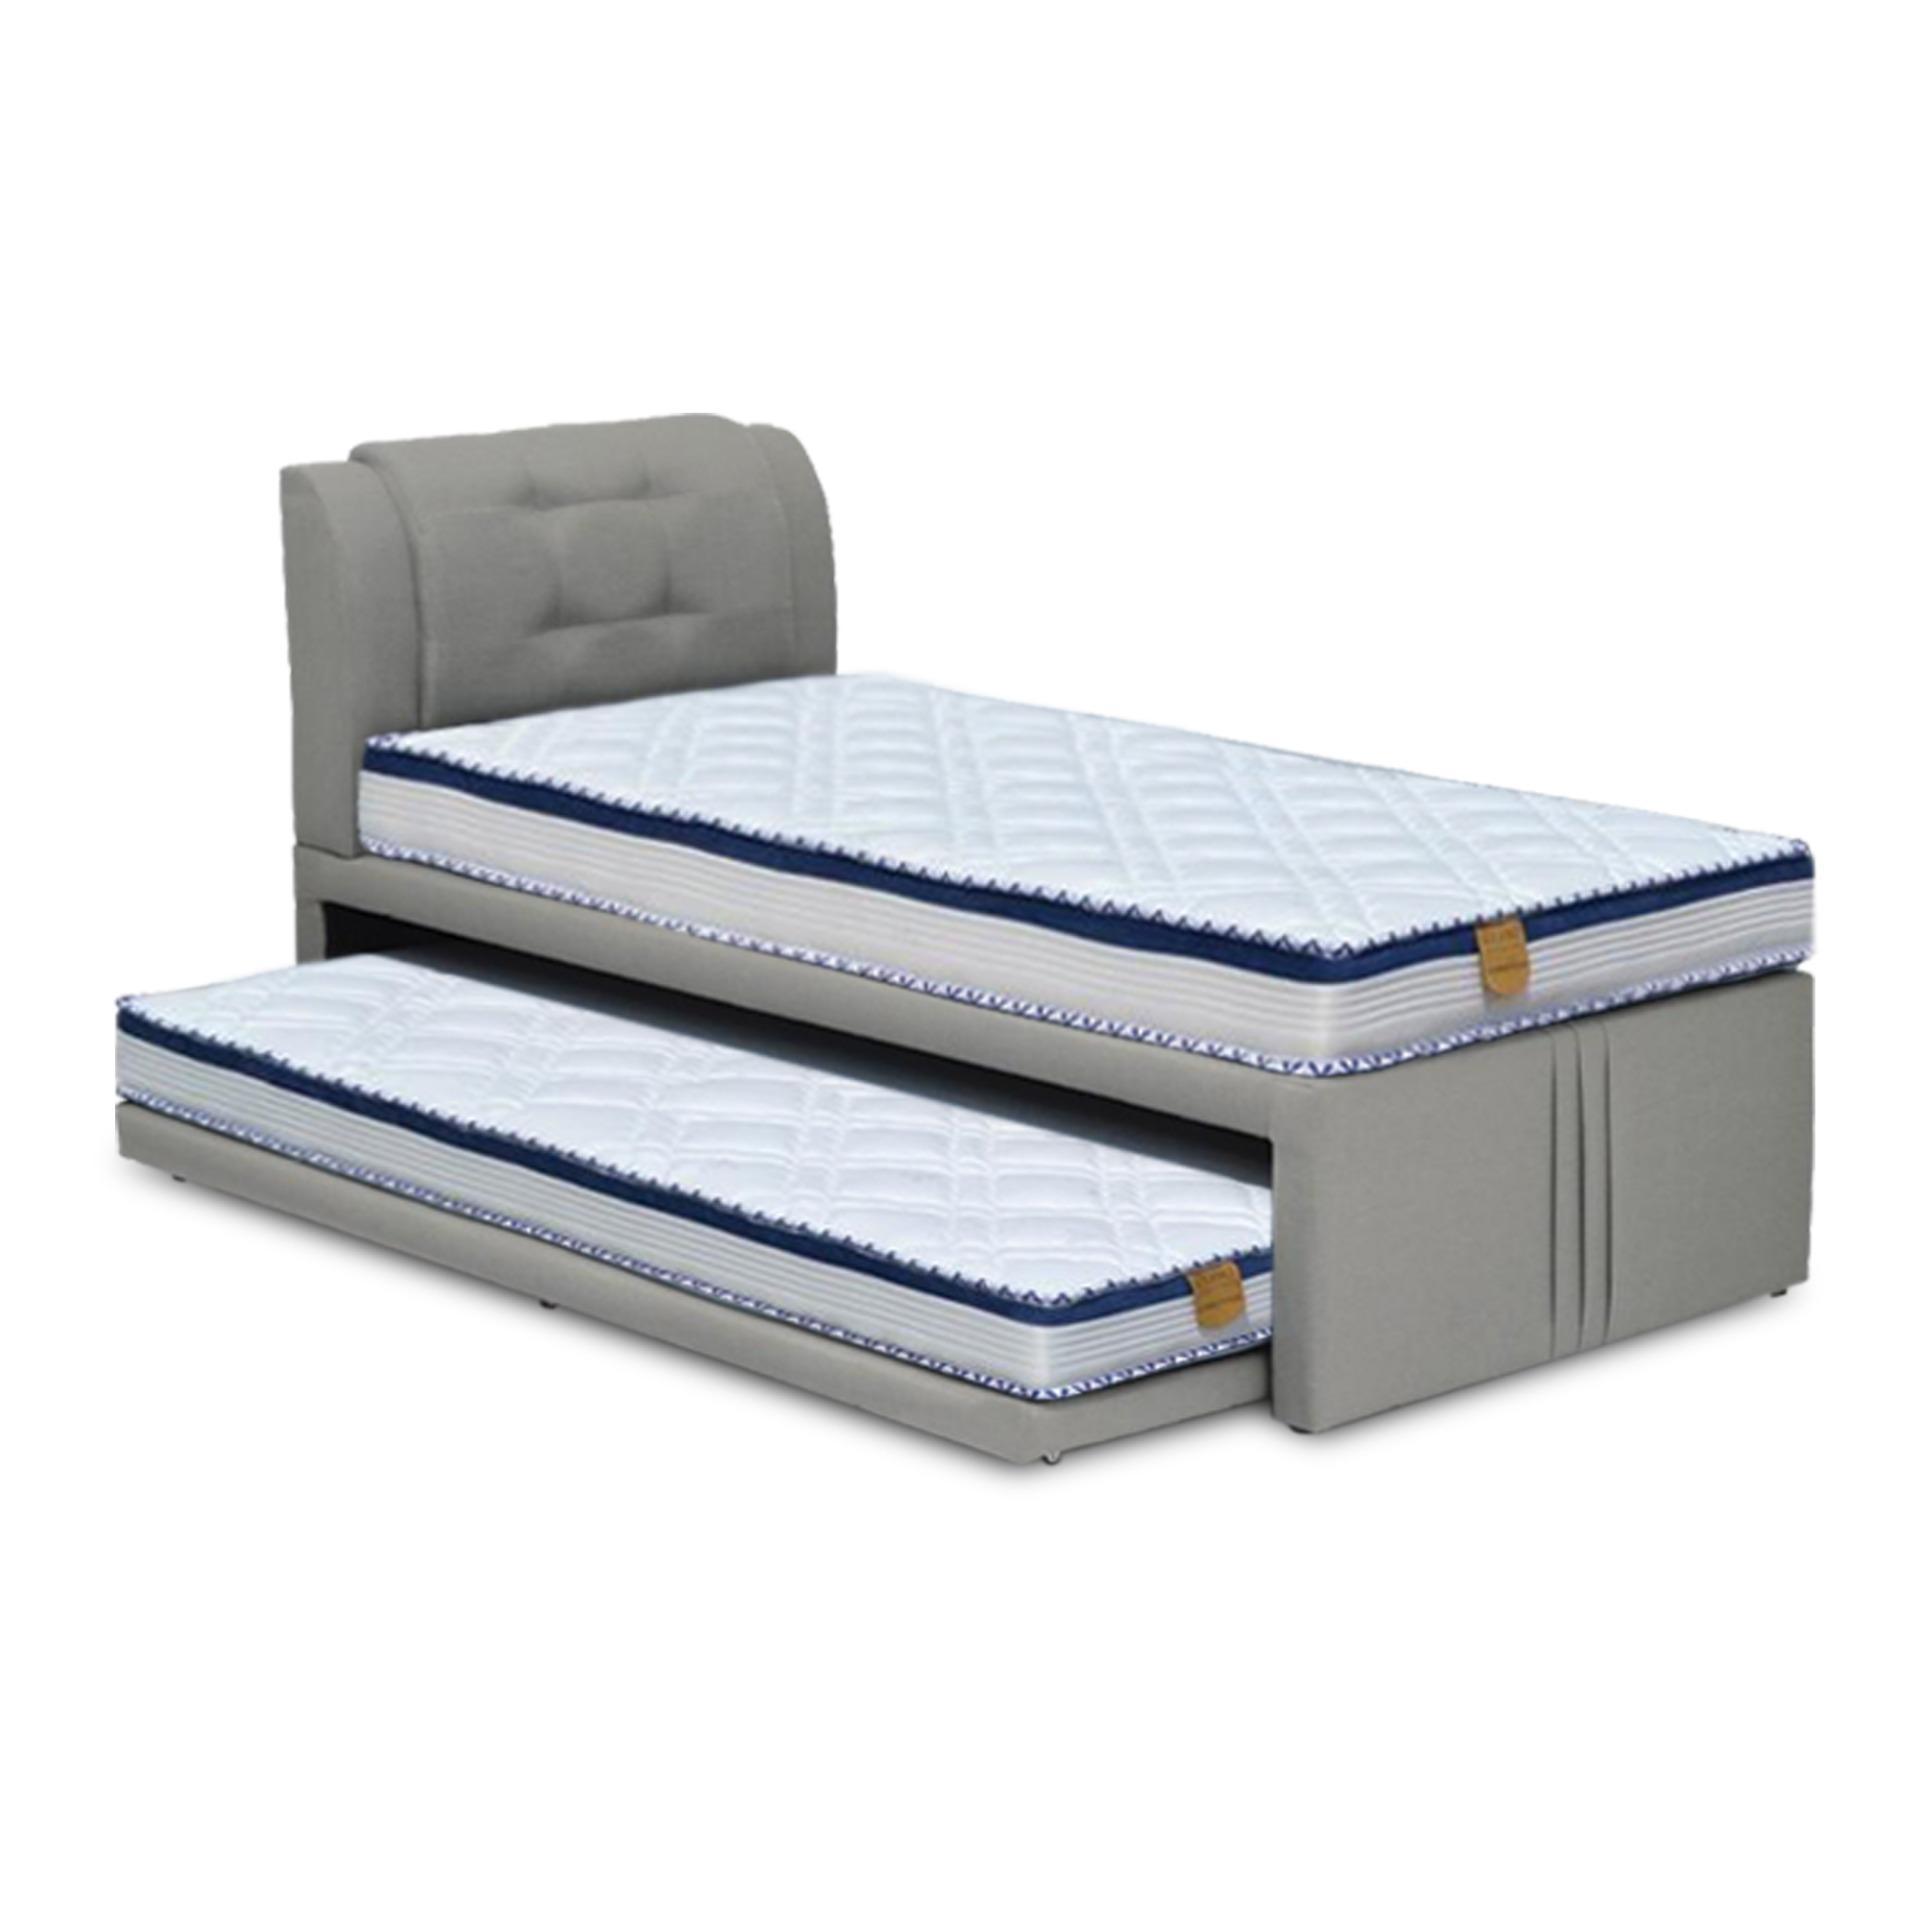 Loris 3-in-1 Bed + Foam Mattress (Top Single, Bottom Single)(FREE DELIVERY)(FREE ASSEMBLY)